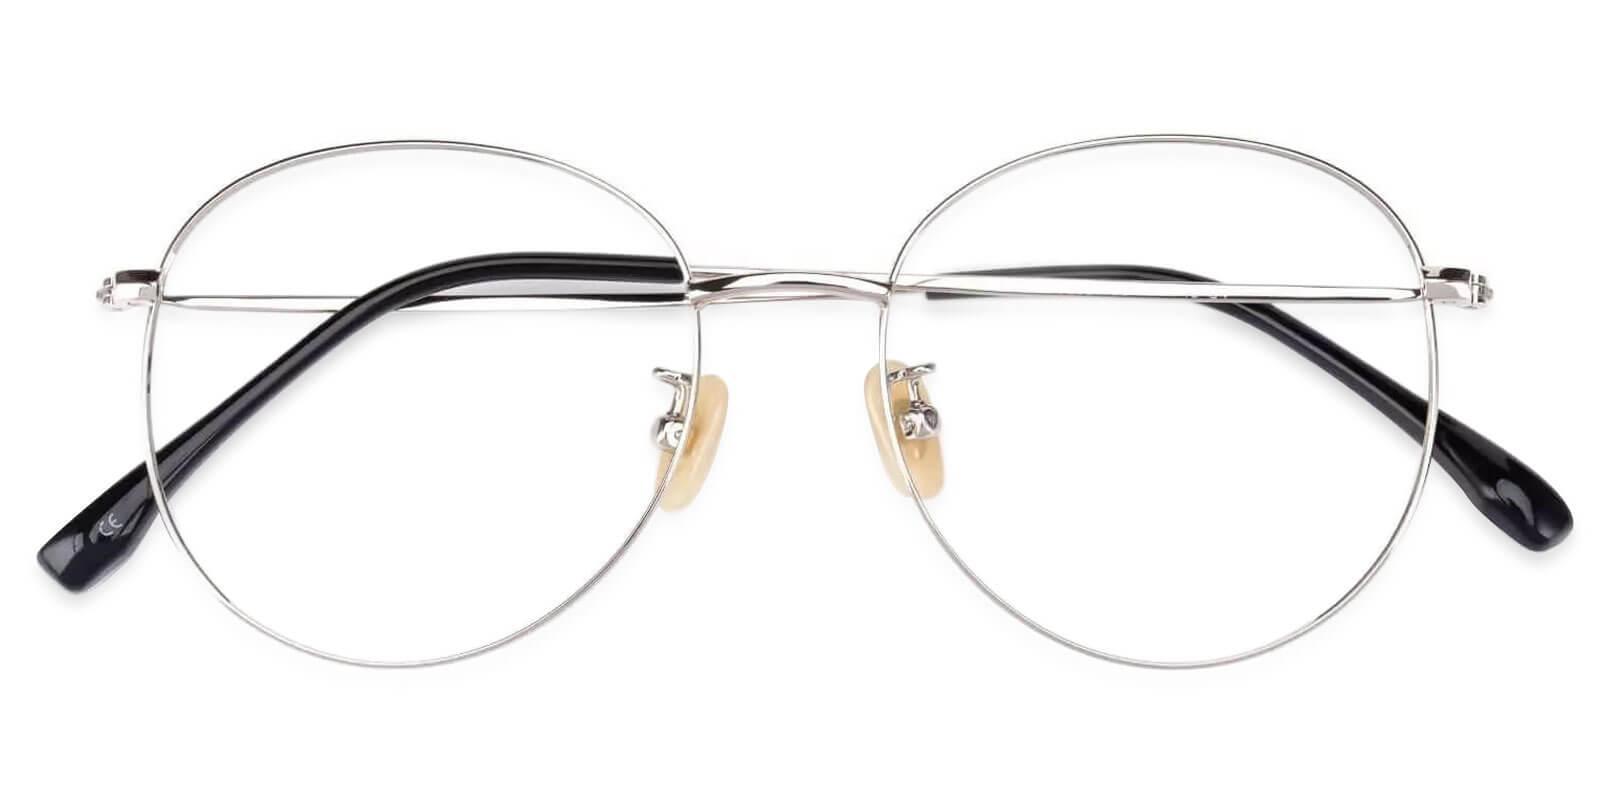 Mongolia Silver Titanium Eyeglasses , Lightweight , NosePads Frames from ABBE Glasses